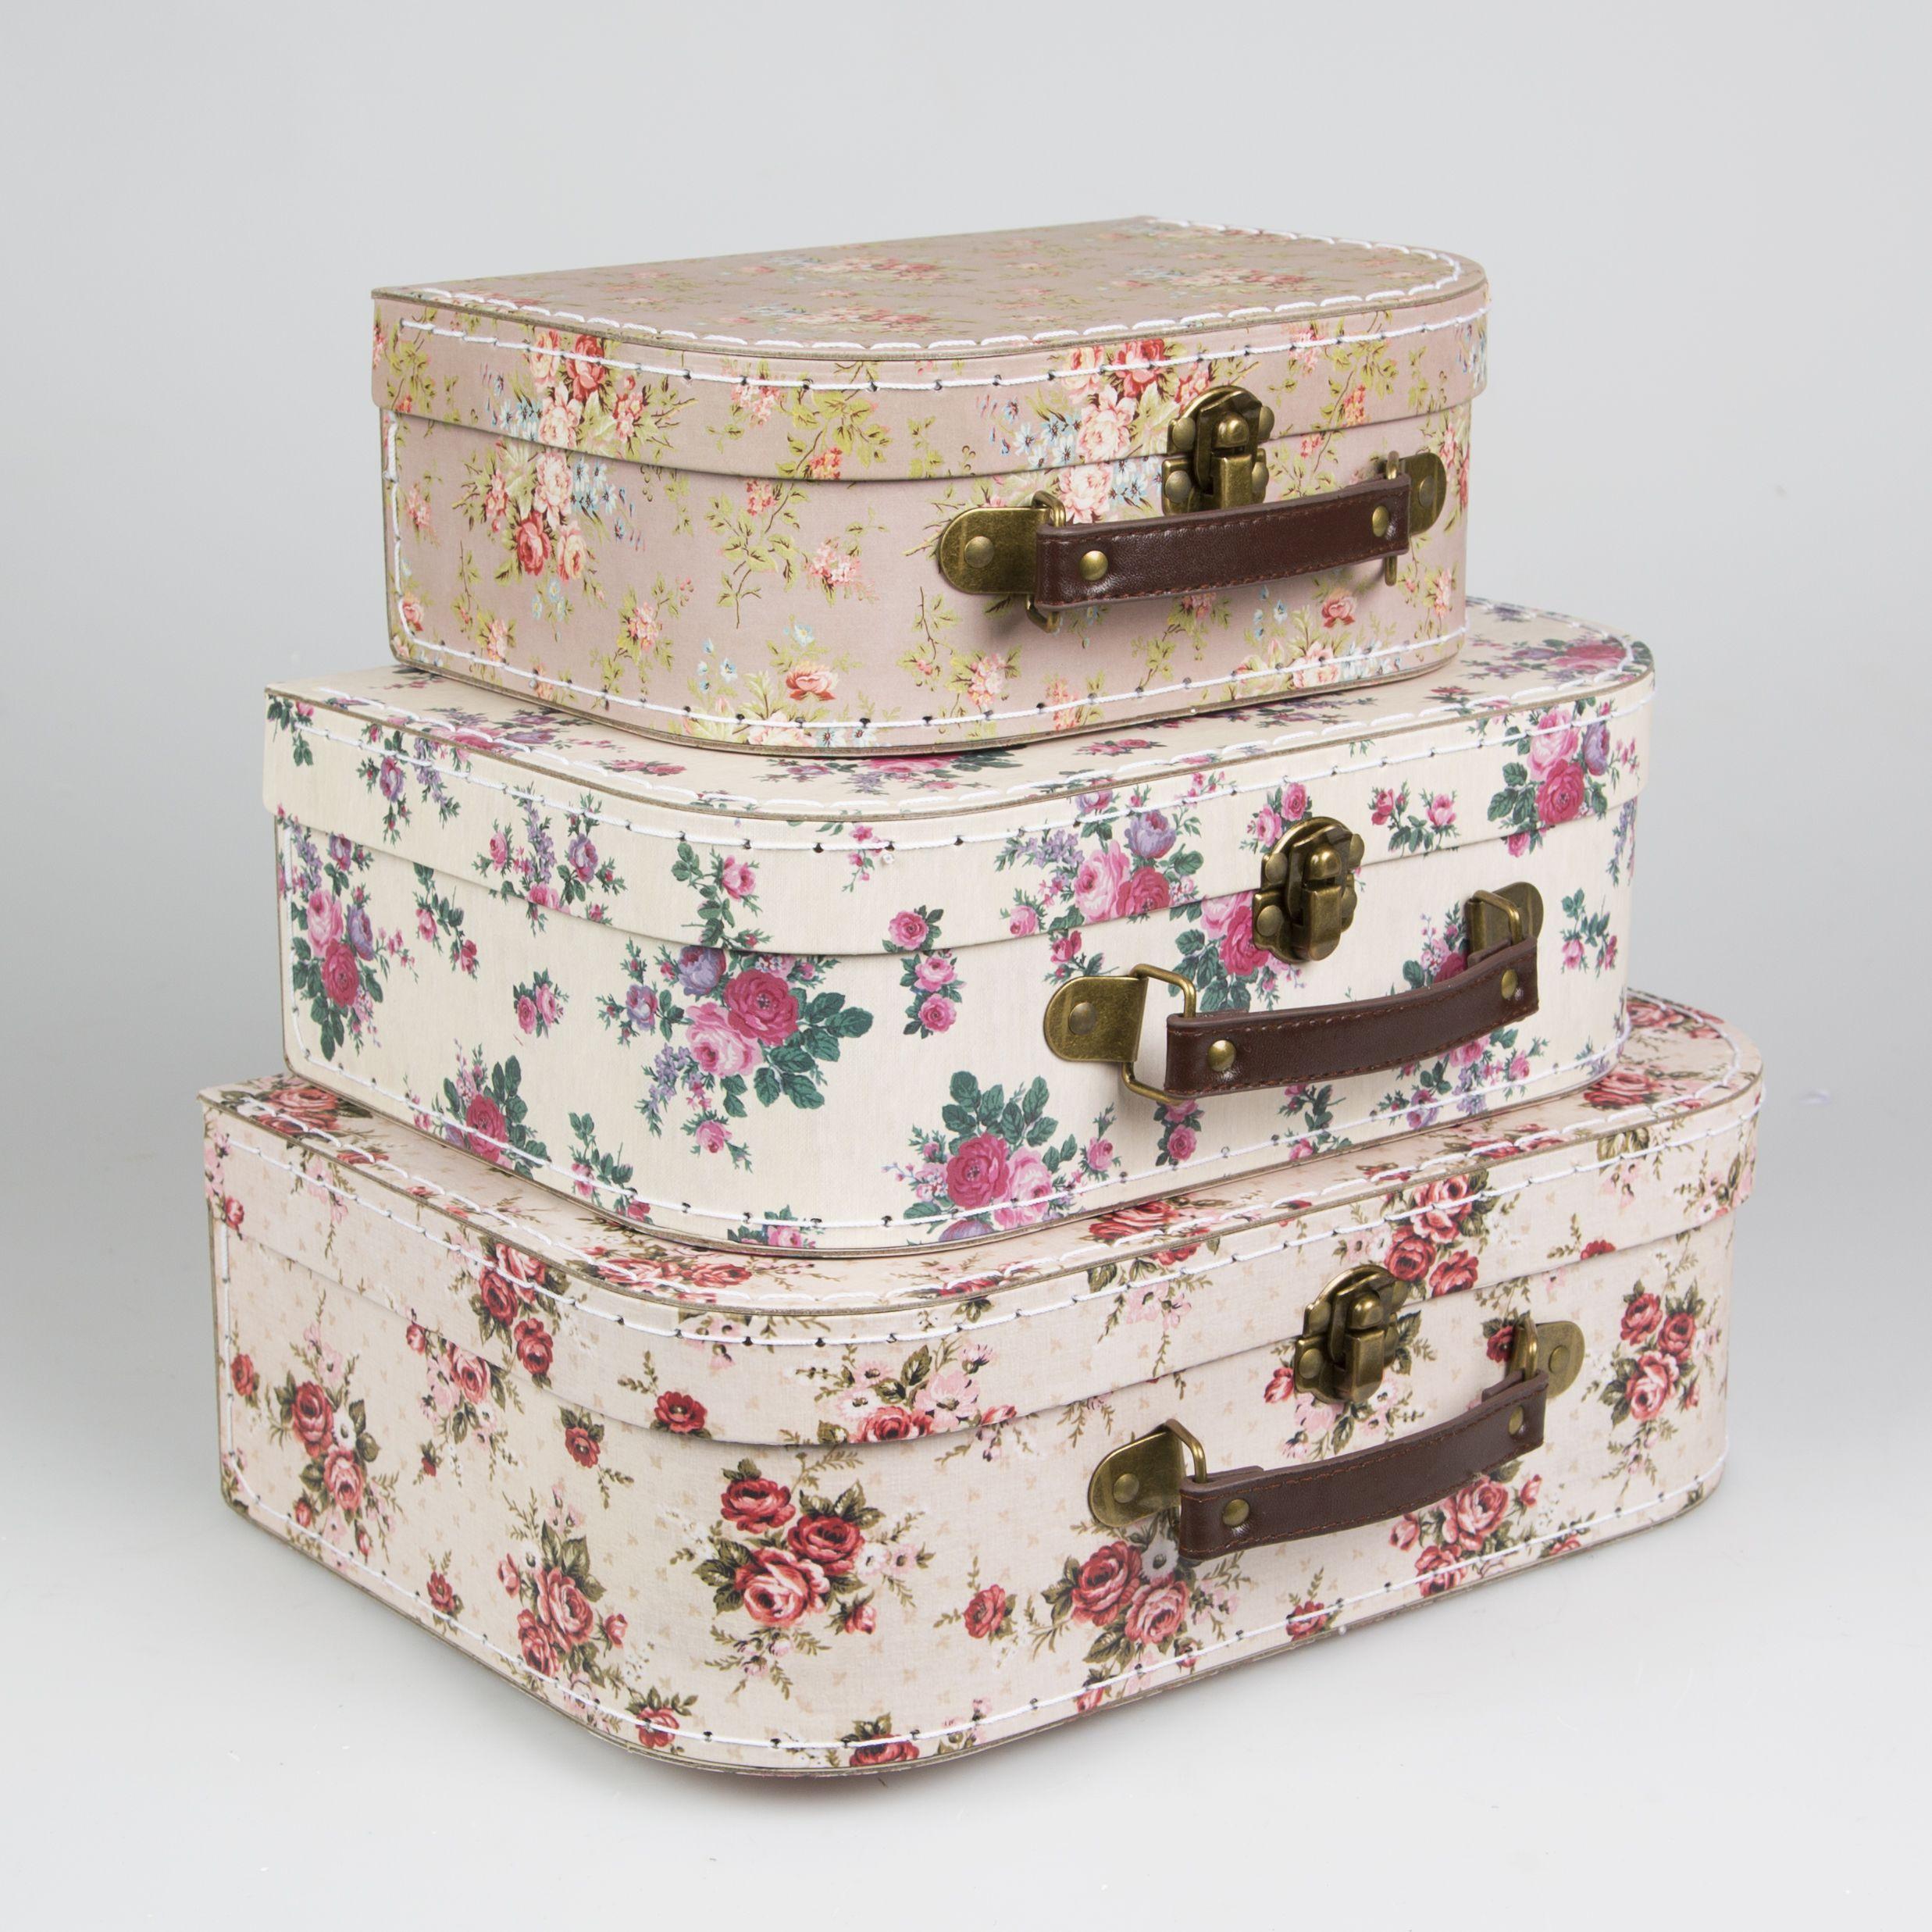 Decorative Luggage Box Vintage Rose Suitcases  Set Of 3  Decorative Suitcases & Storage